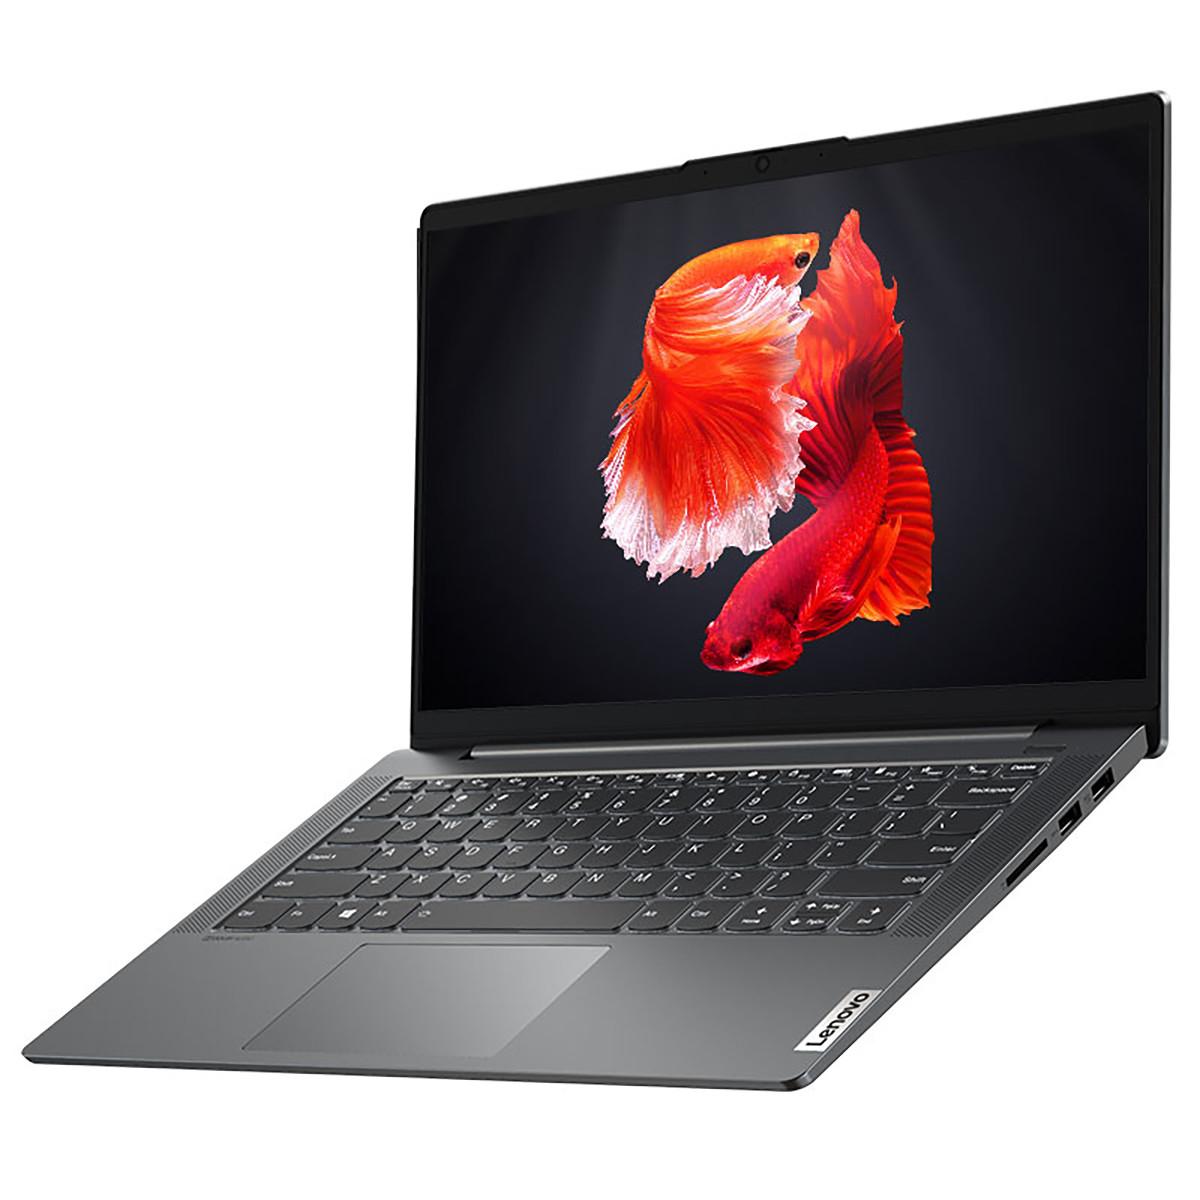 Lenovo 联想 小新Air14 2020 锐龙版 14英寸 笔记本电脑 灰色(锐龙R5-4600U、核芯显卡、8GB、512GB SSD、1080P、60Hz)